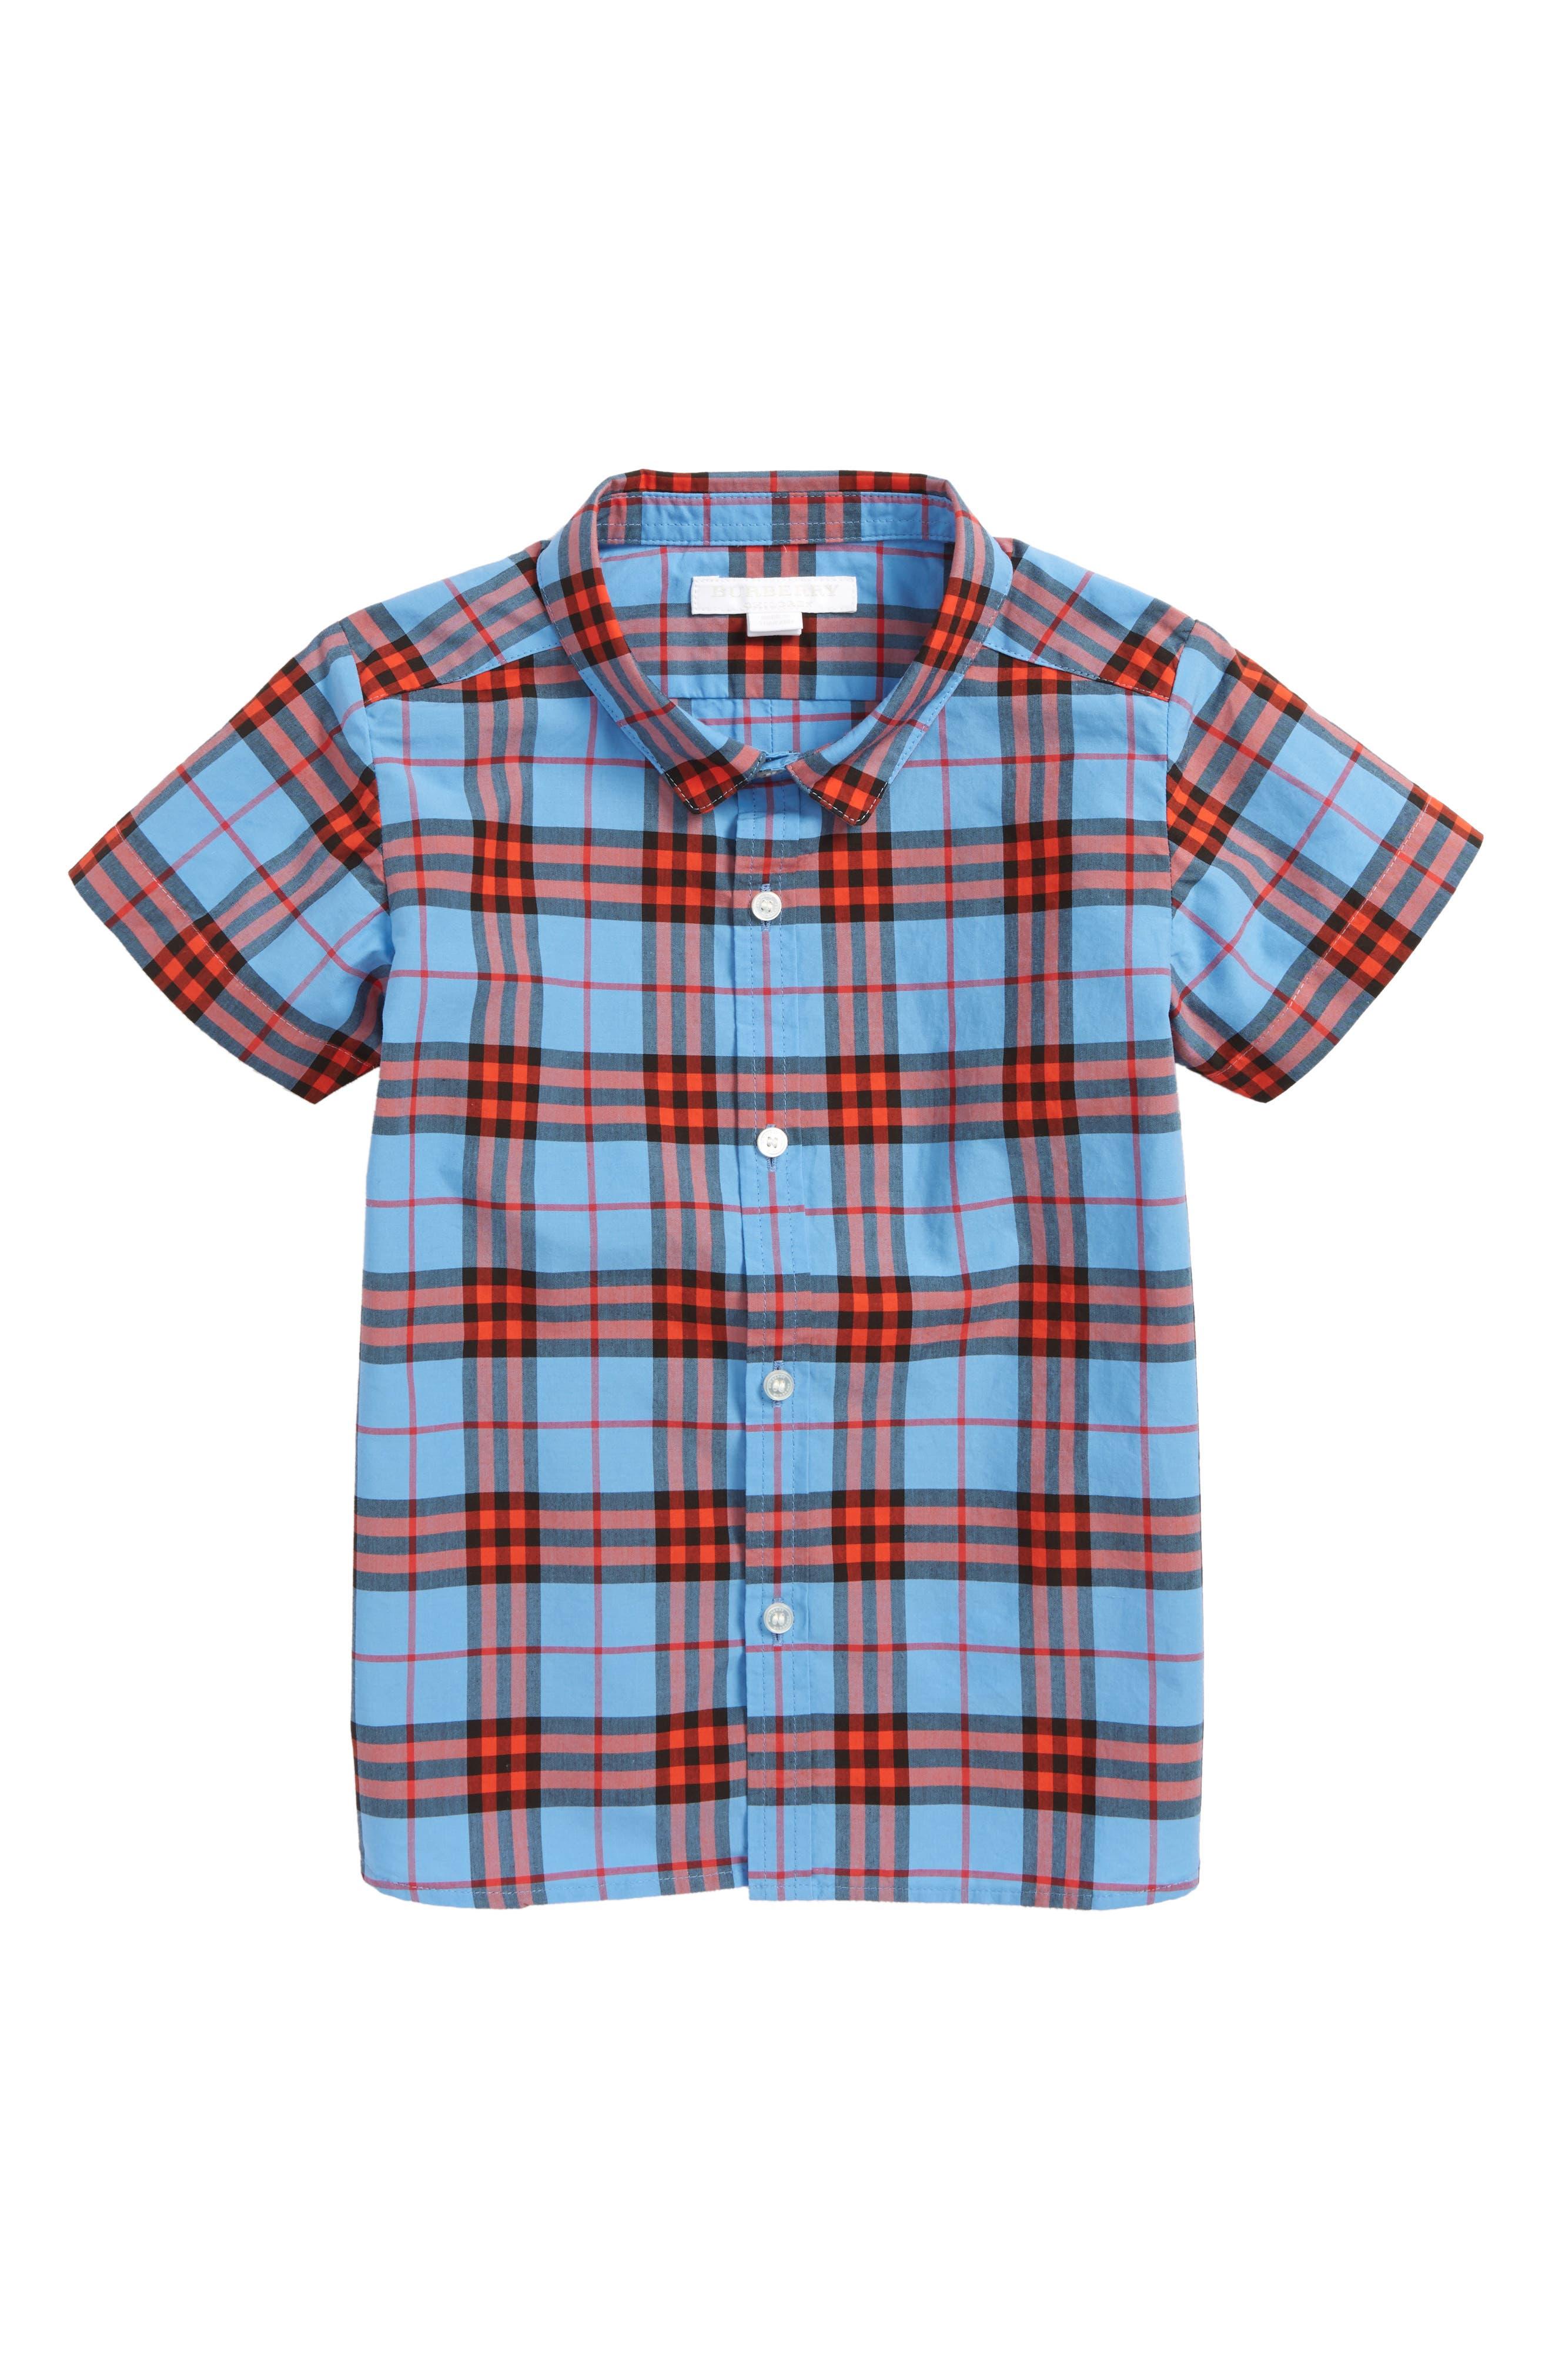 Clarkey Plaid Short Sleeve Shirt,                         Main,                         color, CORNFLOWER BLUE